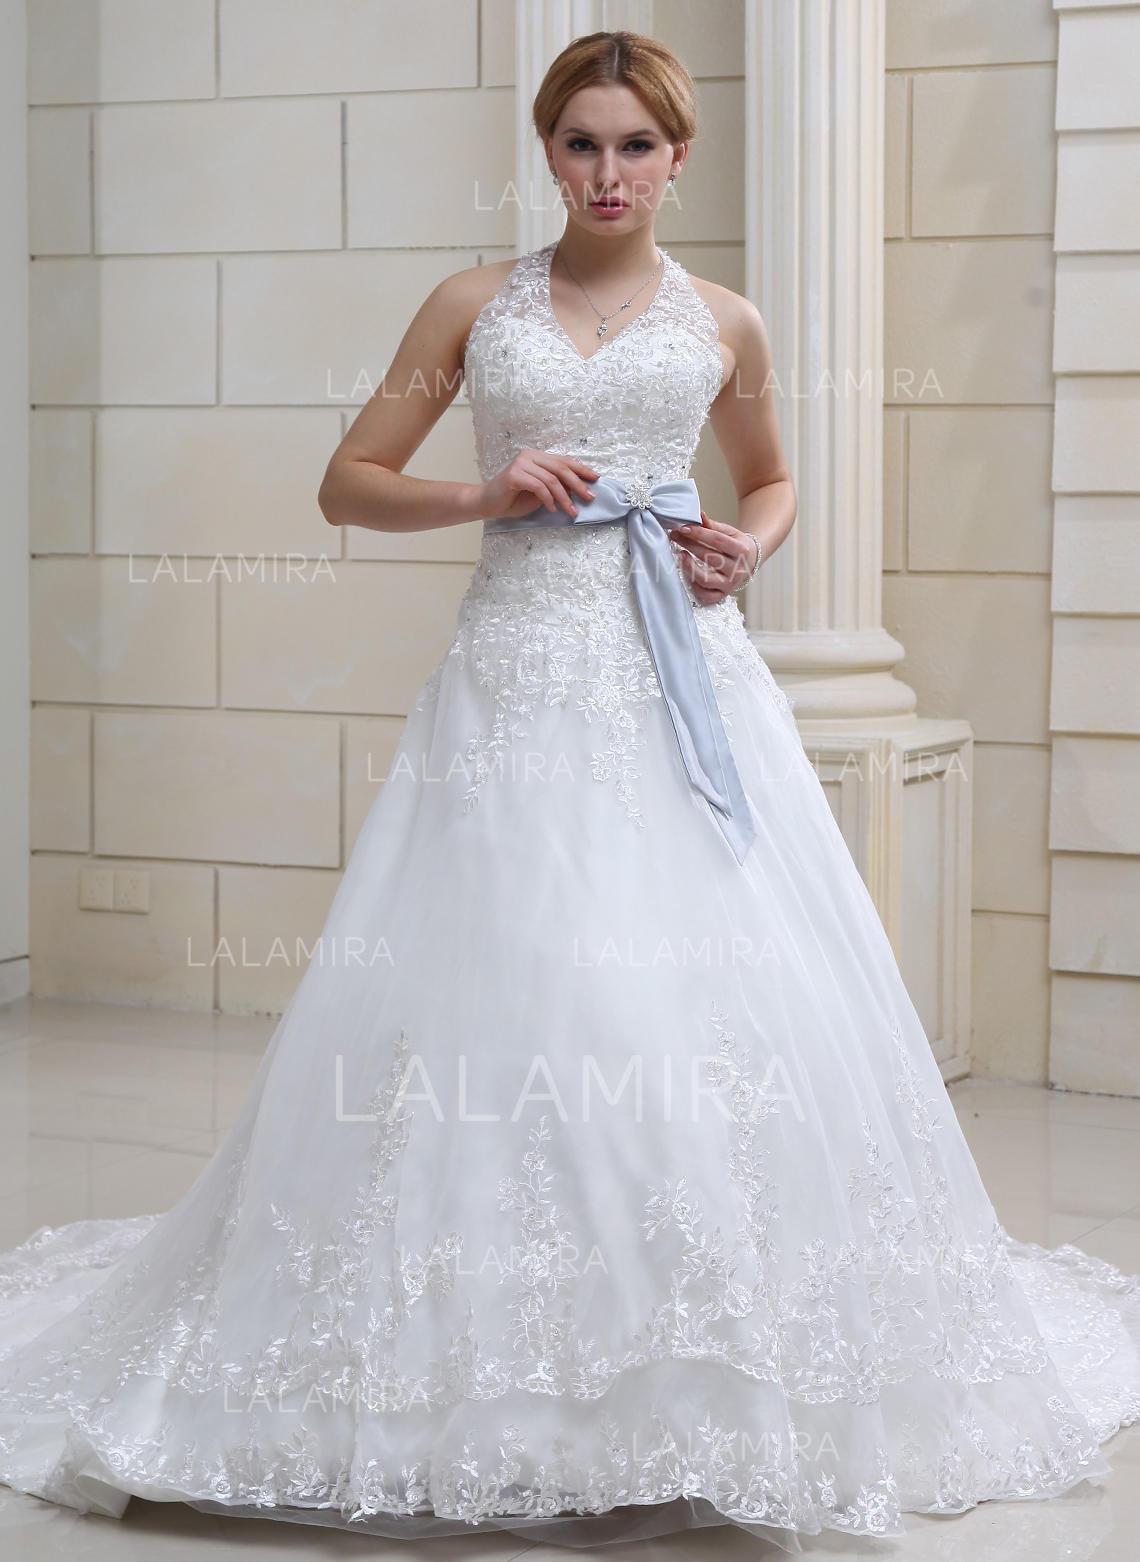 Halter Ball Gown Wedding Dresses Organza Lace Sash Crystal Brooch